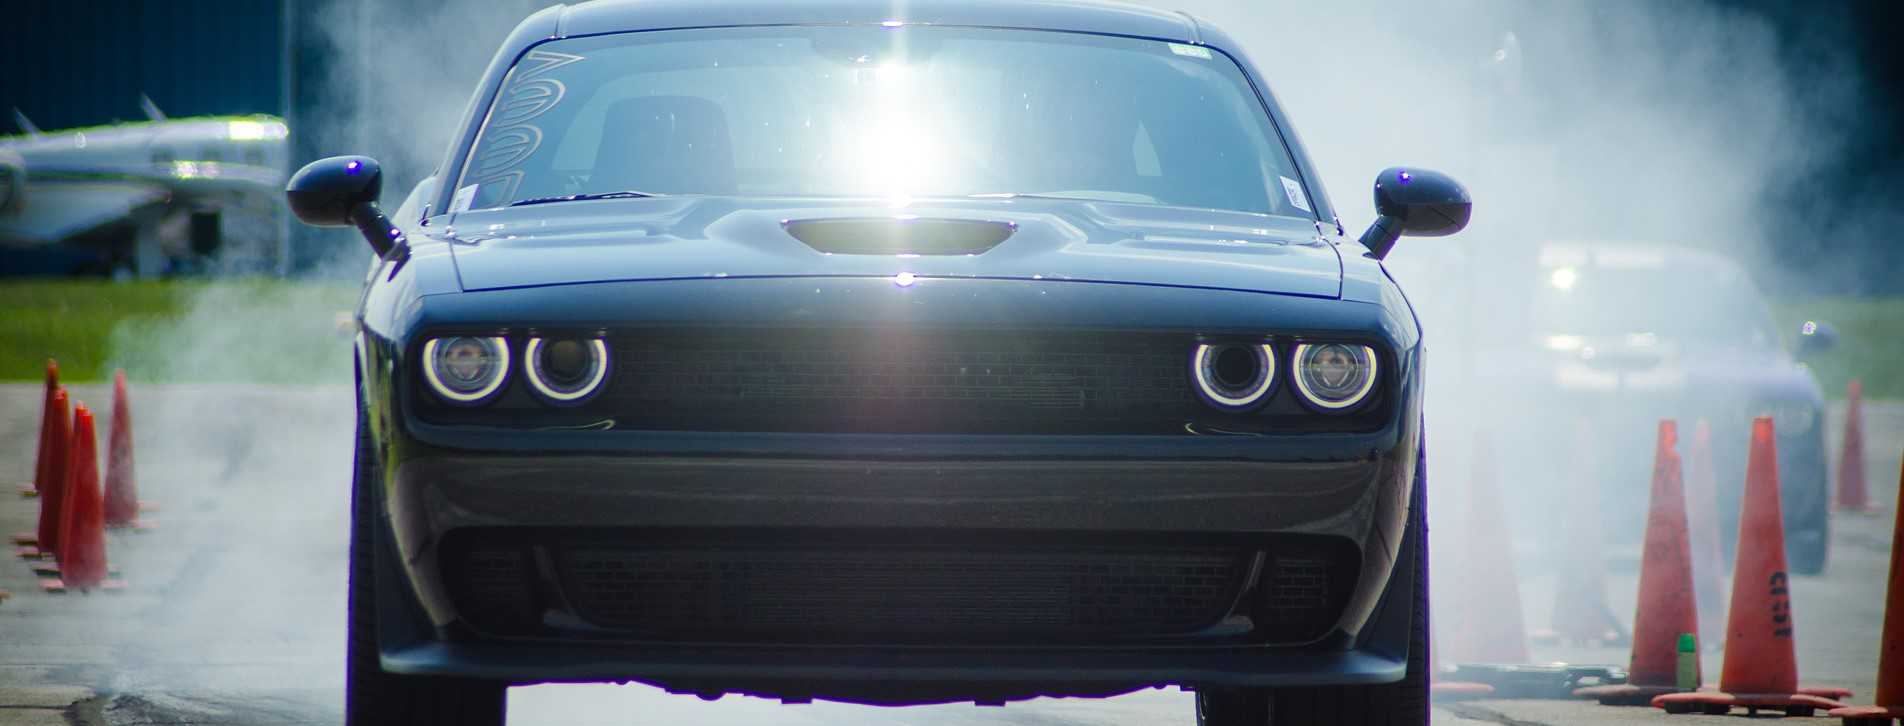 Dodge in Jamaica, New York   Kids Car Donations